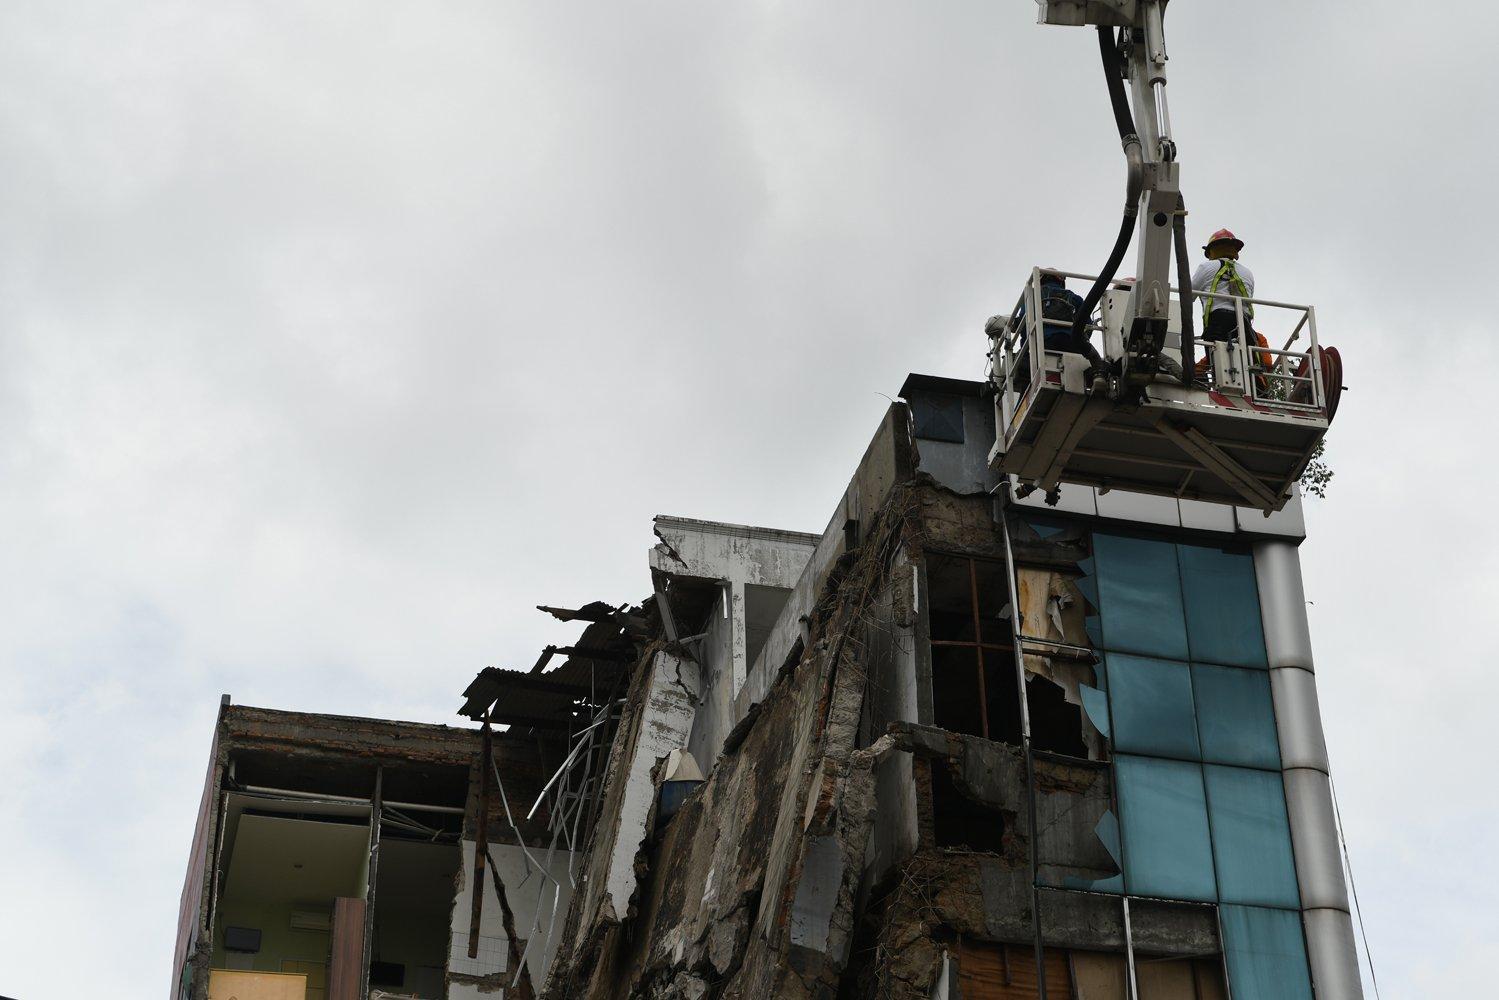 Anggota Dinas Penanggulangan Kebakaran dan Penyelamatan Provinsi DKI Jakarta bersama anggota Basarnas bersiap melakukan evakuasi terhadap bangunan yang ambruk di Jalan Brigjen Katamso, Kota Bambu Selatan, Palmerah, Jakarta Barat, Senin (6/1/2020).